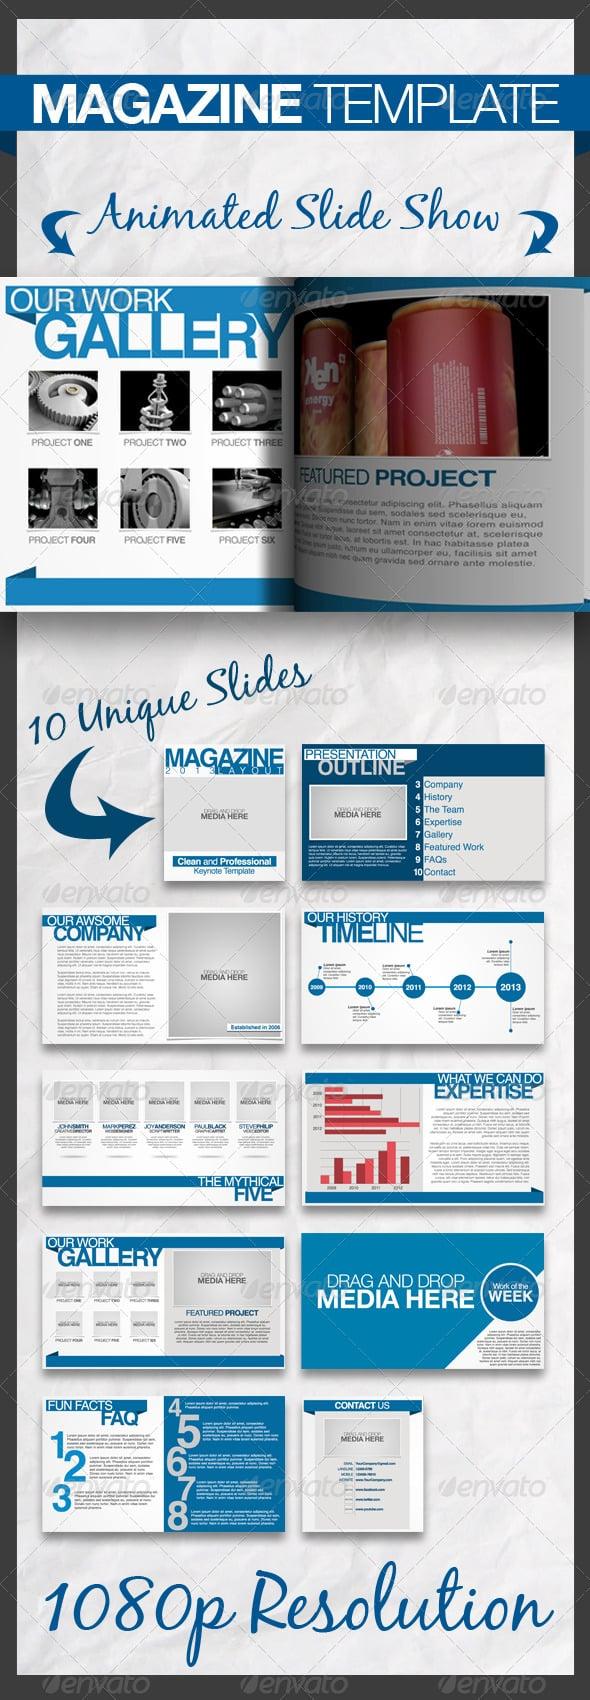 Magazine-Keynote-Presentation-Template